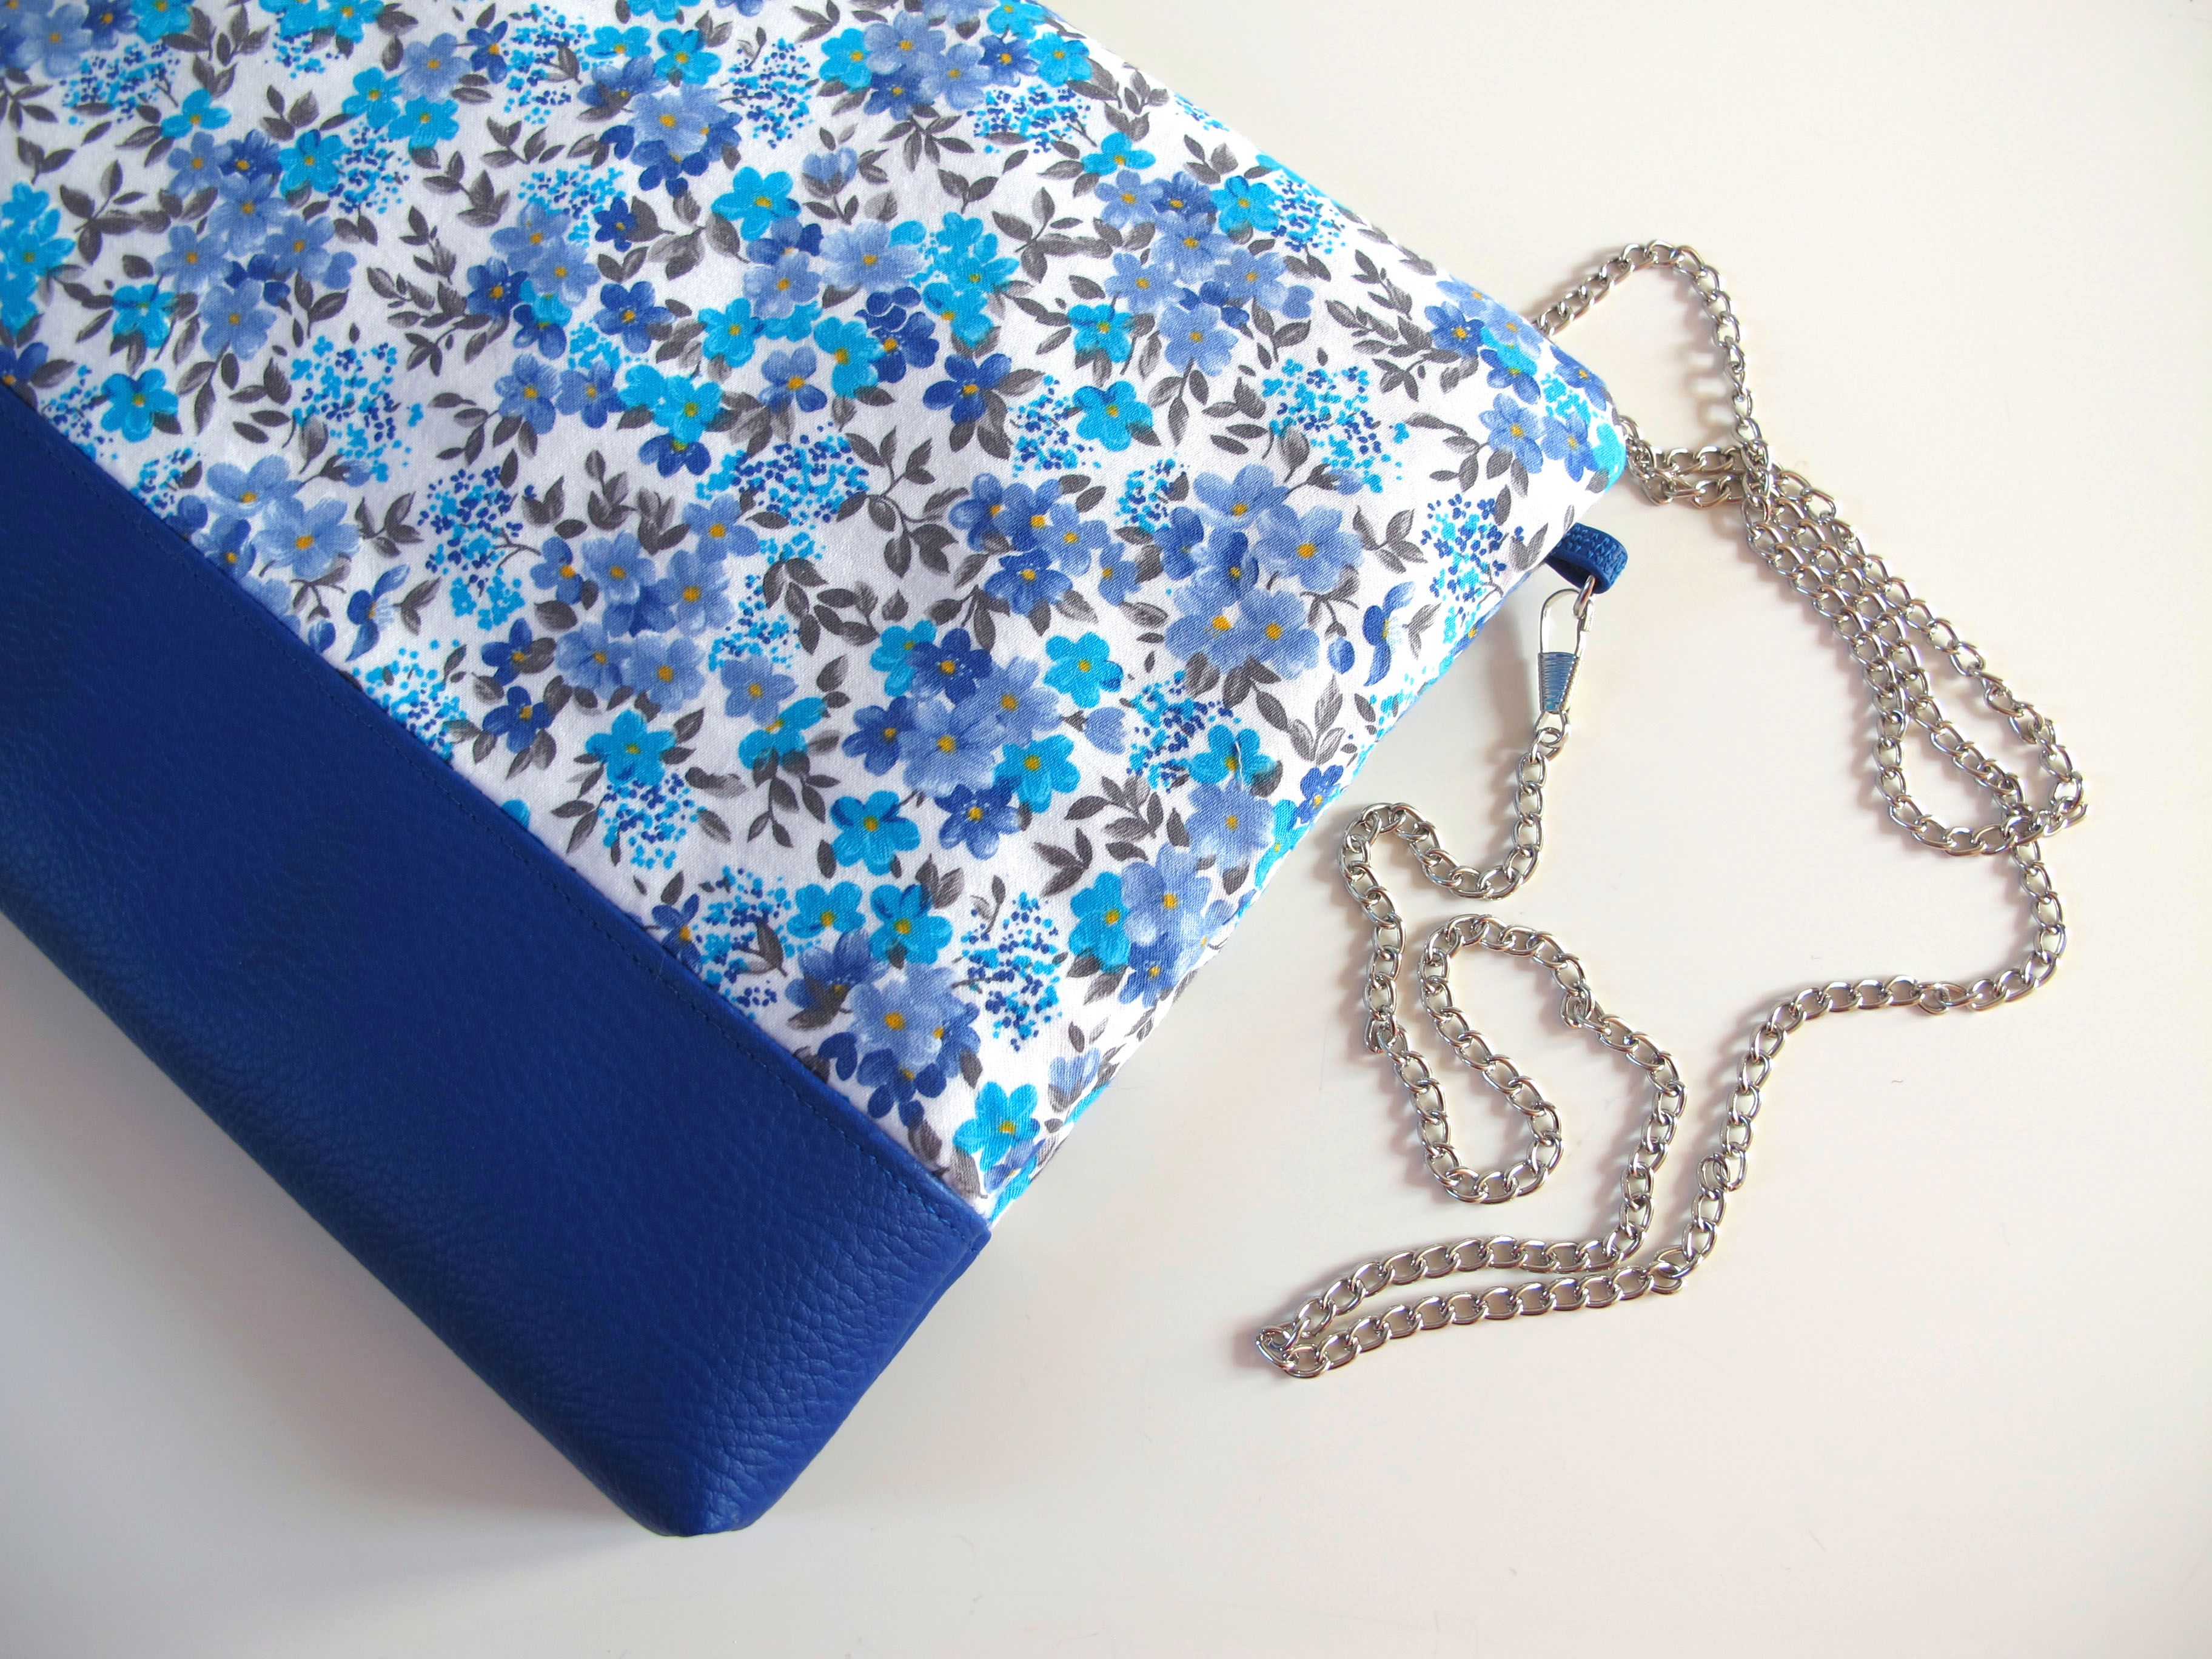 Fiori Blu E Bianchi.Blue And White Flowers Shoulder Bag Nel 2019 Blue Inspiration